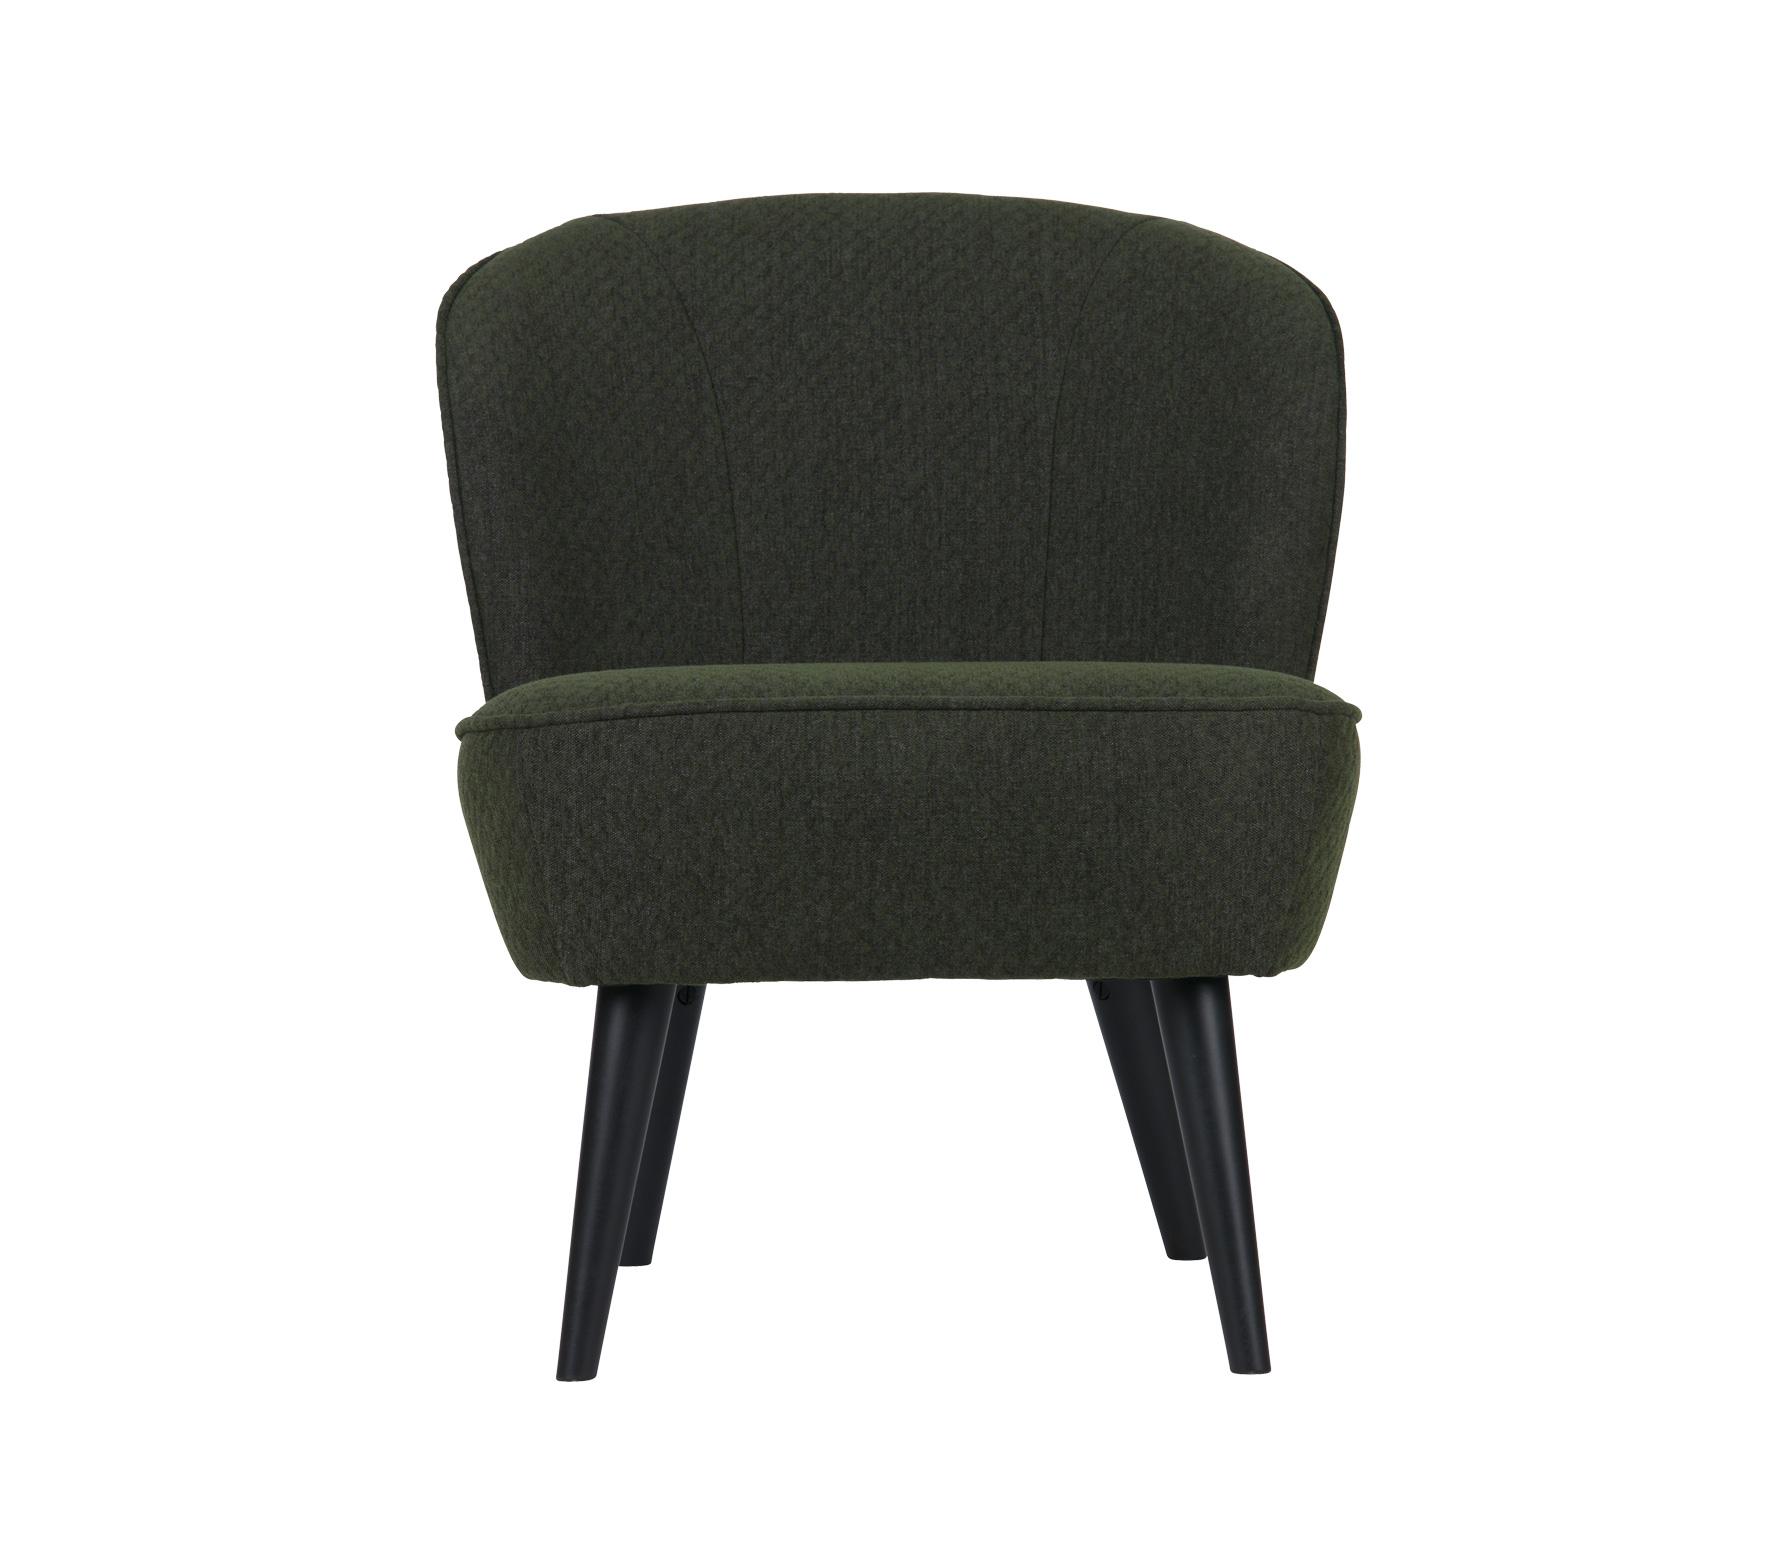 Fauteuils fauteuils online basiclabel for Fauteuil groen